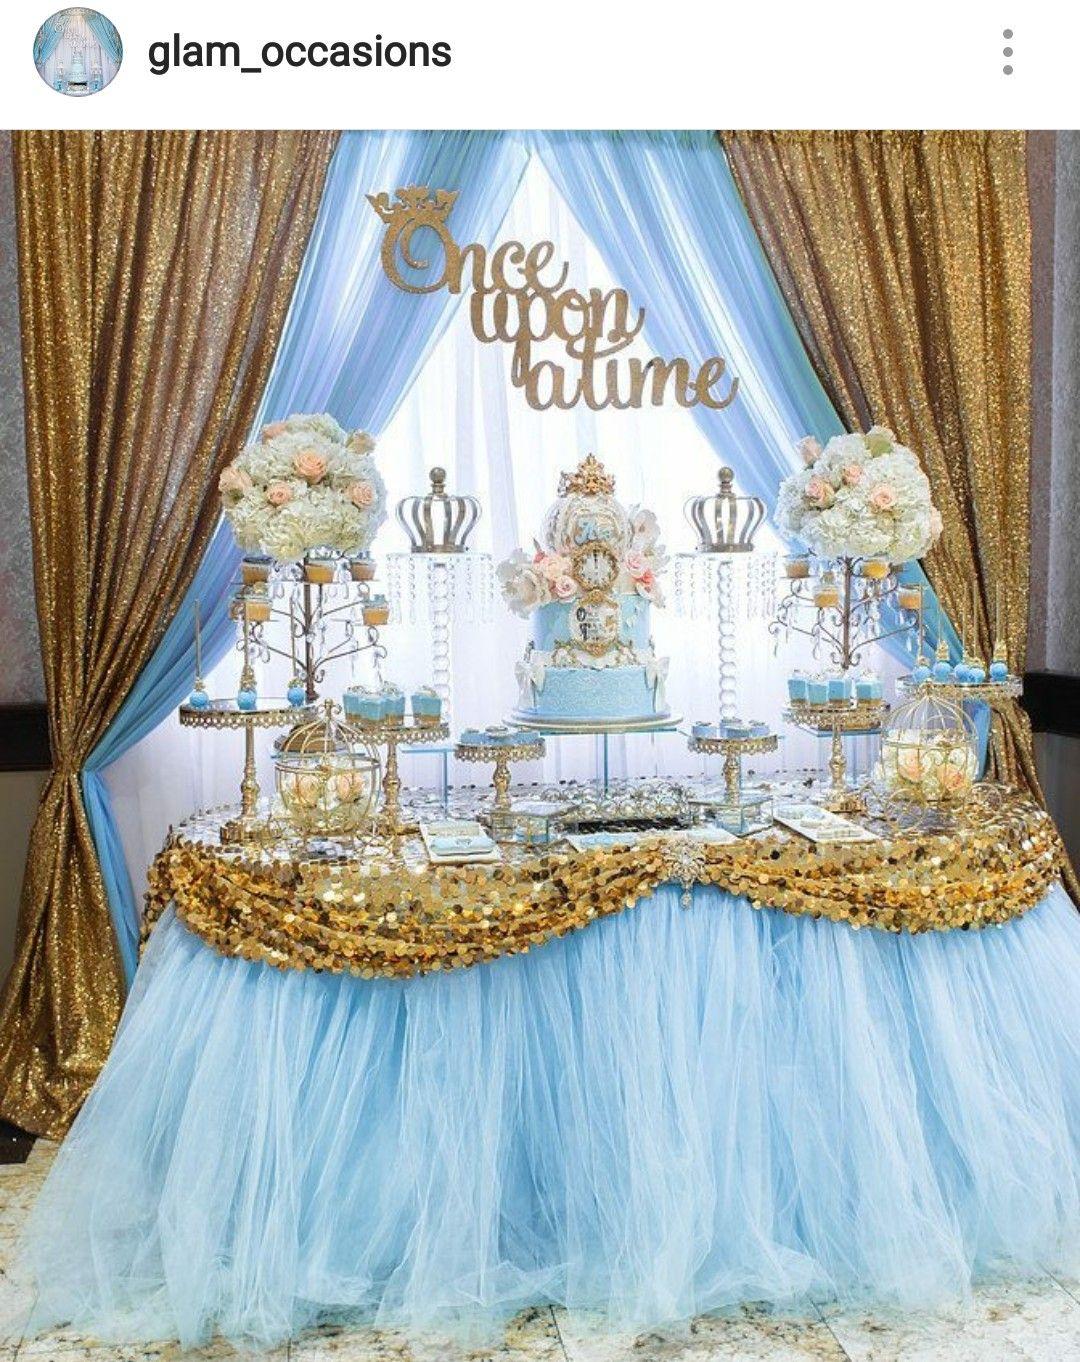 Cinderalla Inspired Birthday Party Dessert Table And Decor Cinderella Party Theme Cinderella Birthday Party Cinderella Quinceanera Themes